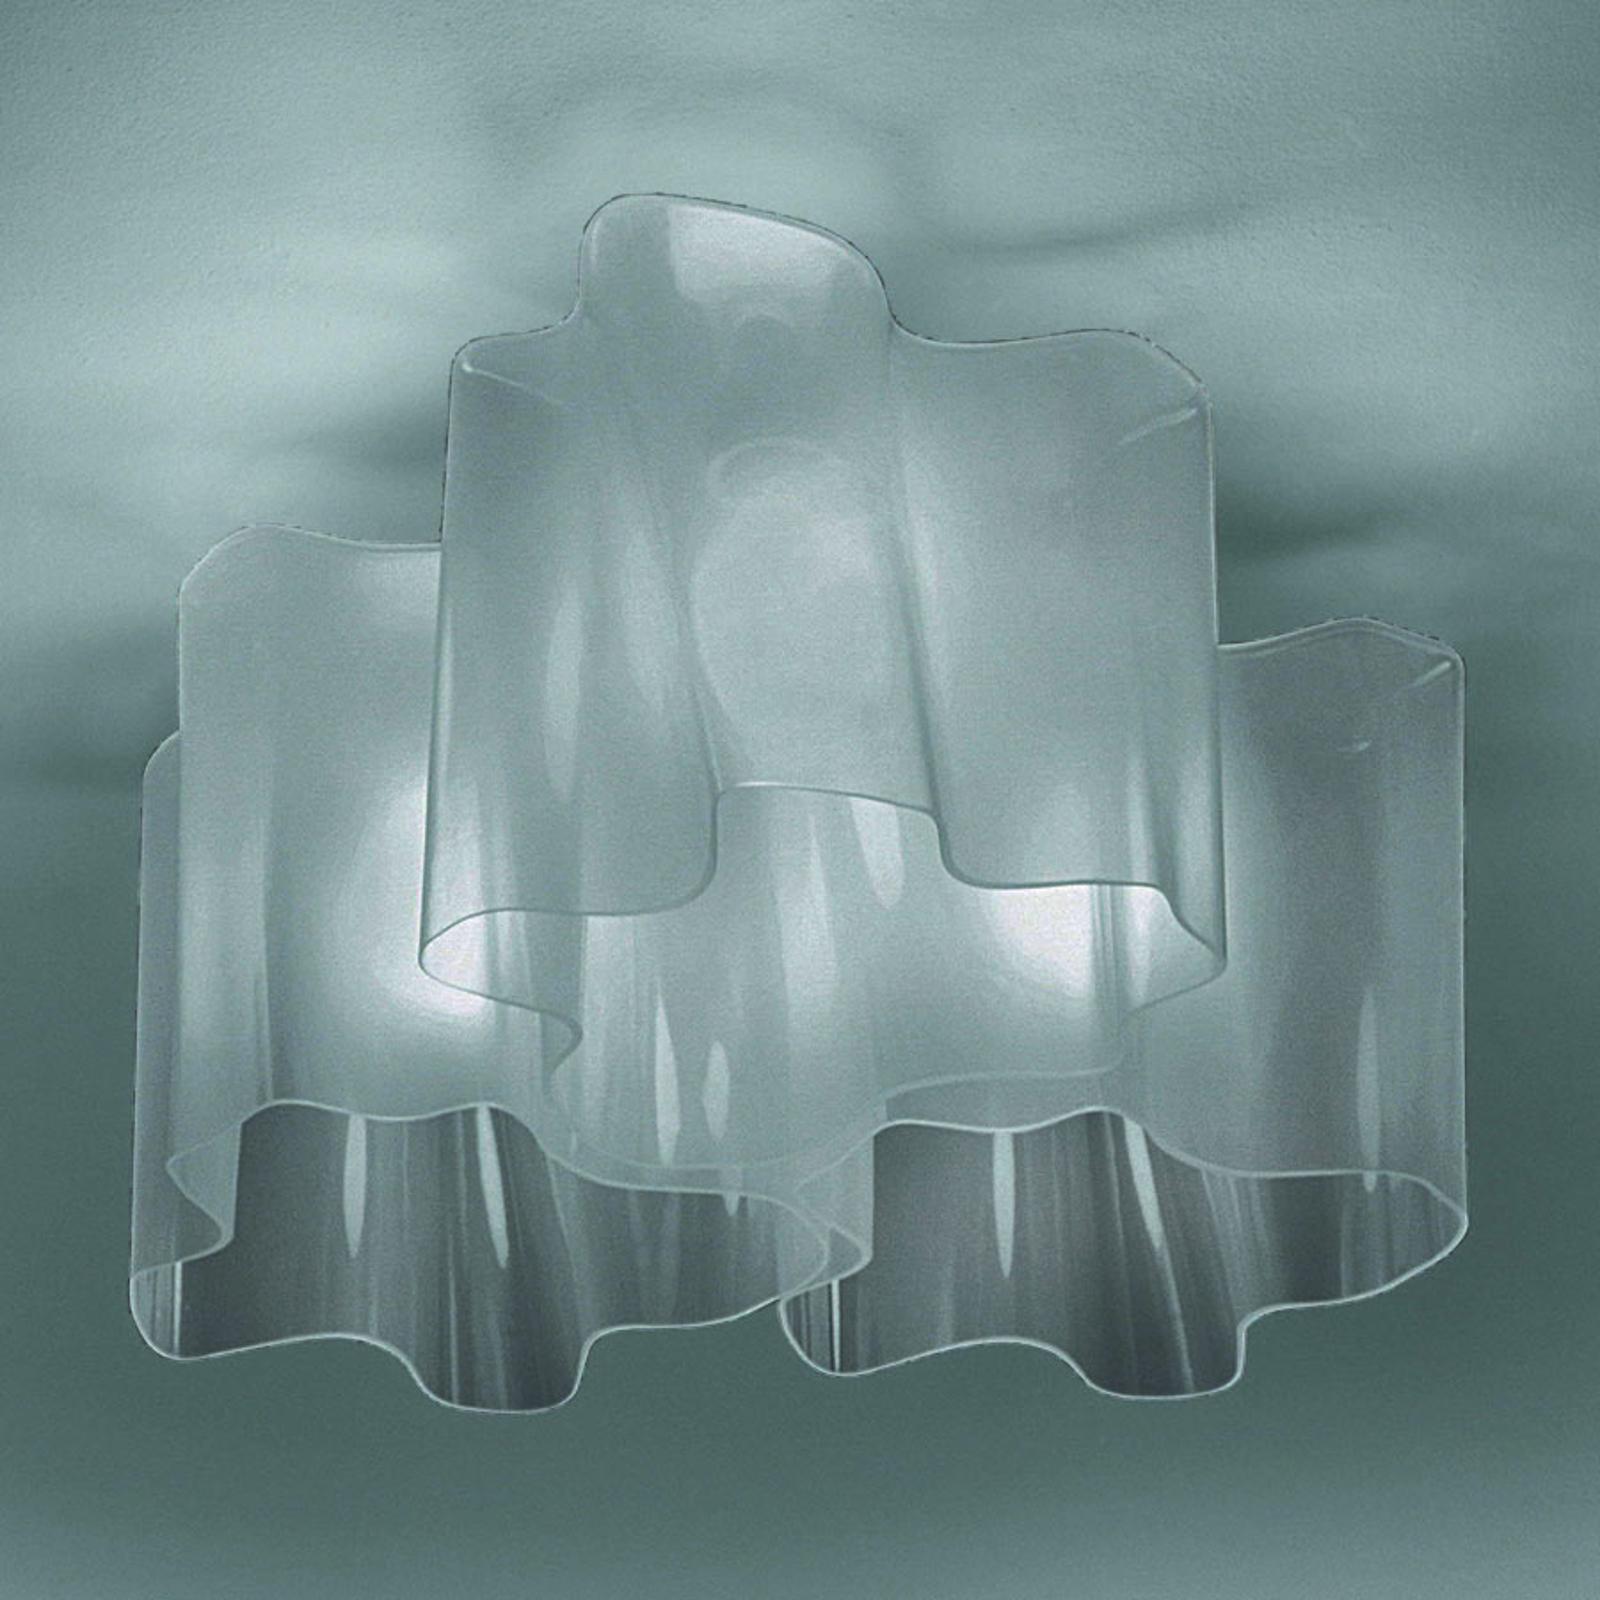 Artemide Logico Deckenlampe 3fl 120° 66x66cm grau